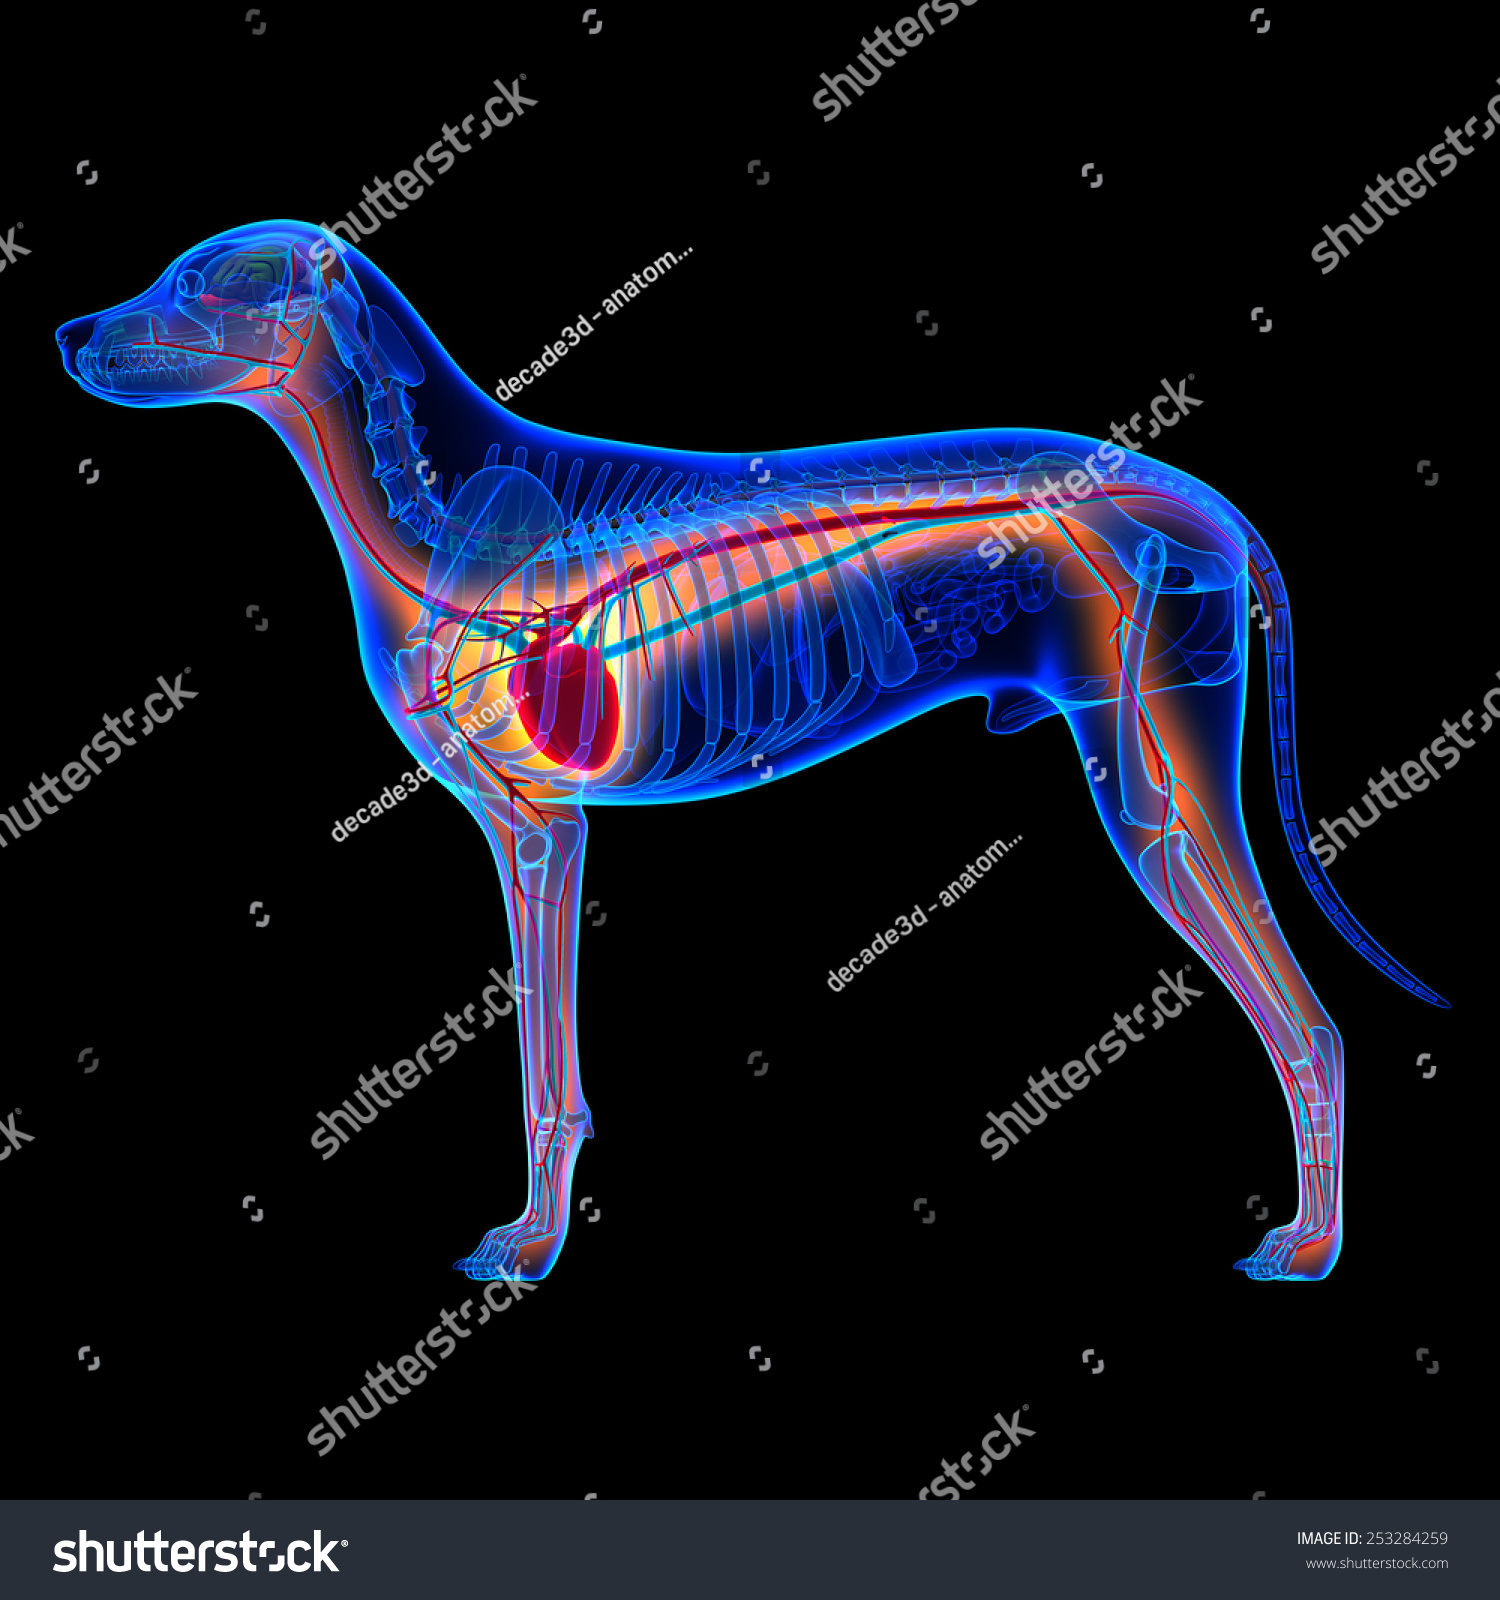 Royalty Free Stock Illustration of Dog Heart Anatomy Circulatory ...